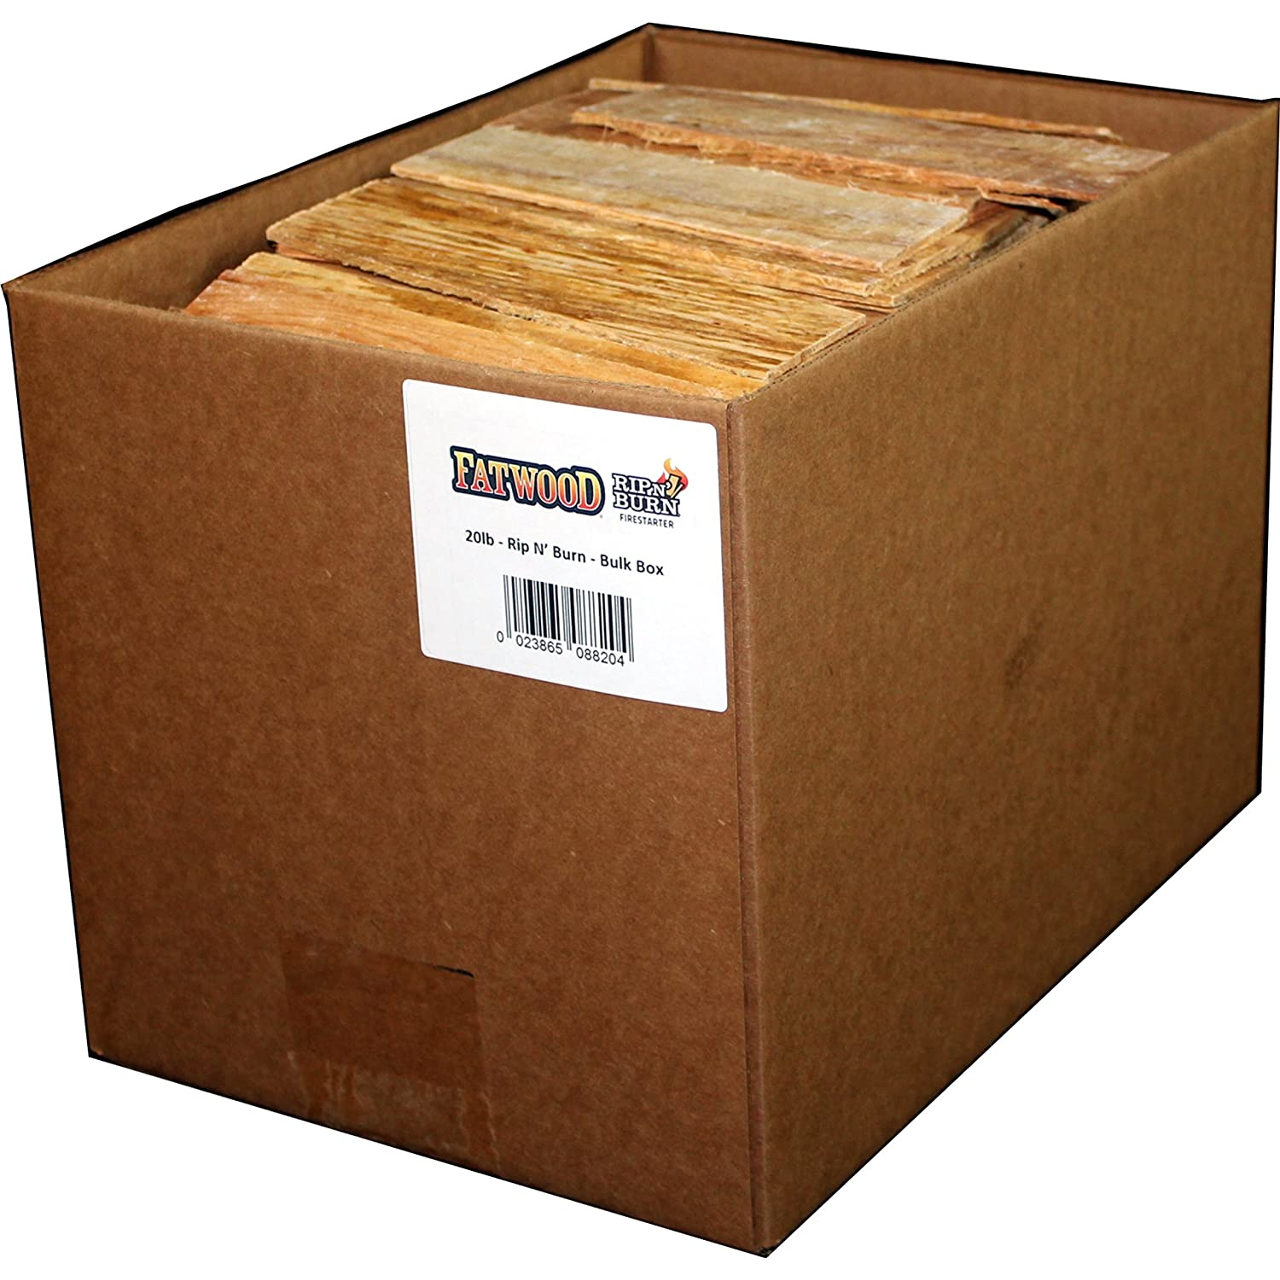 Copperfield 20 lb Fatwood Rip N Burn Bulk Box